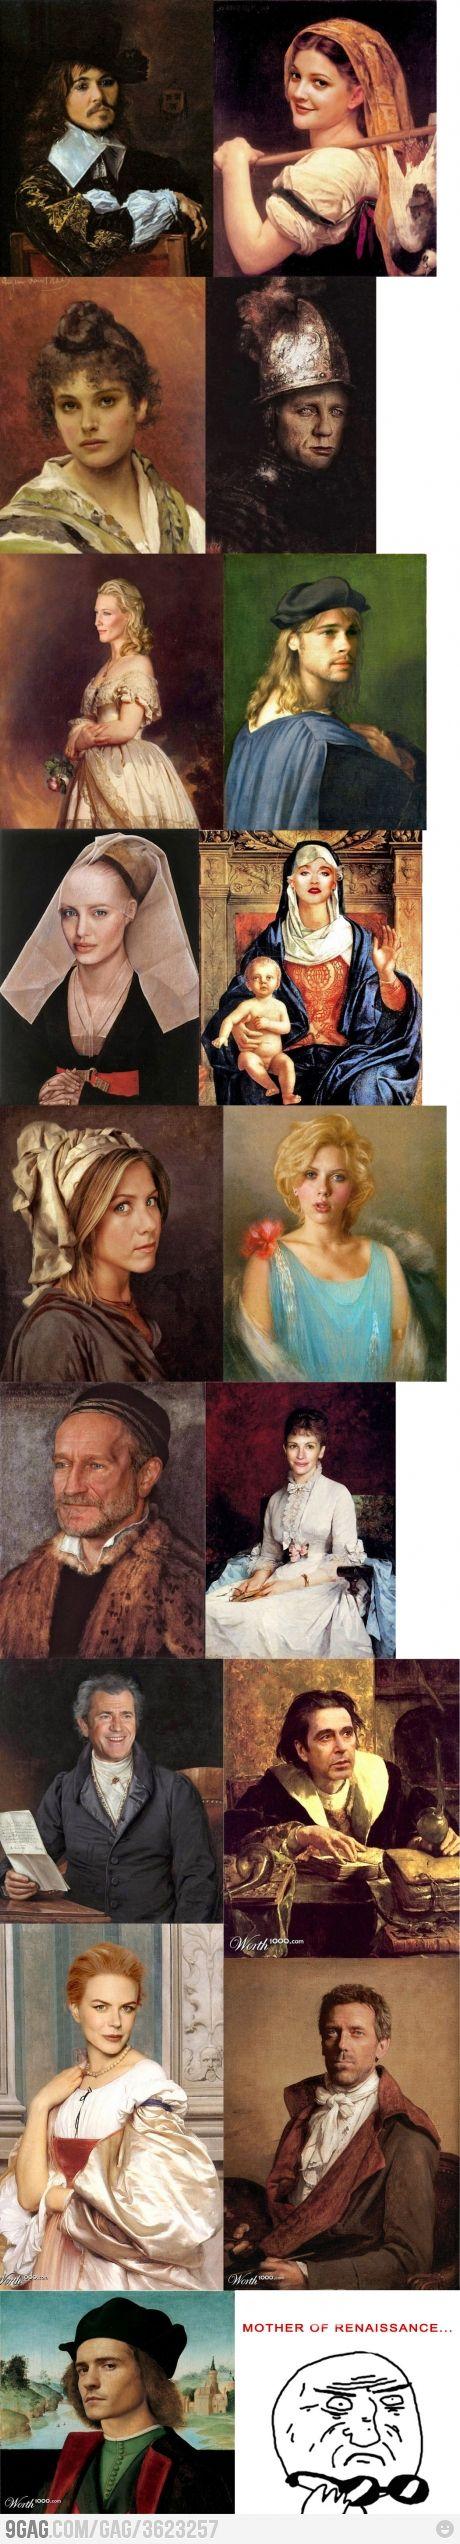 : Johnny Depp, Orlando Bloom, Funny Celebrity, Stuff, Awesome, Hollywood Actor, Art History, Renaissance Art, Funny Art